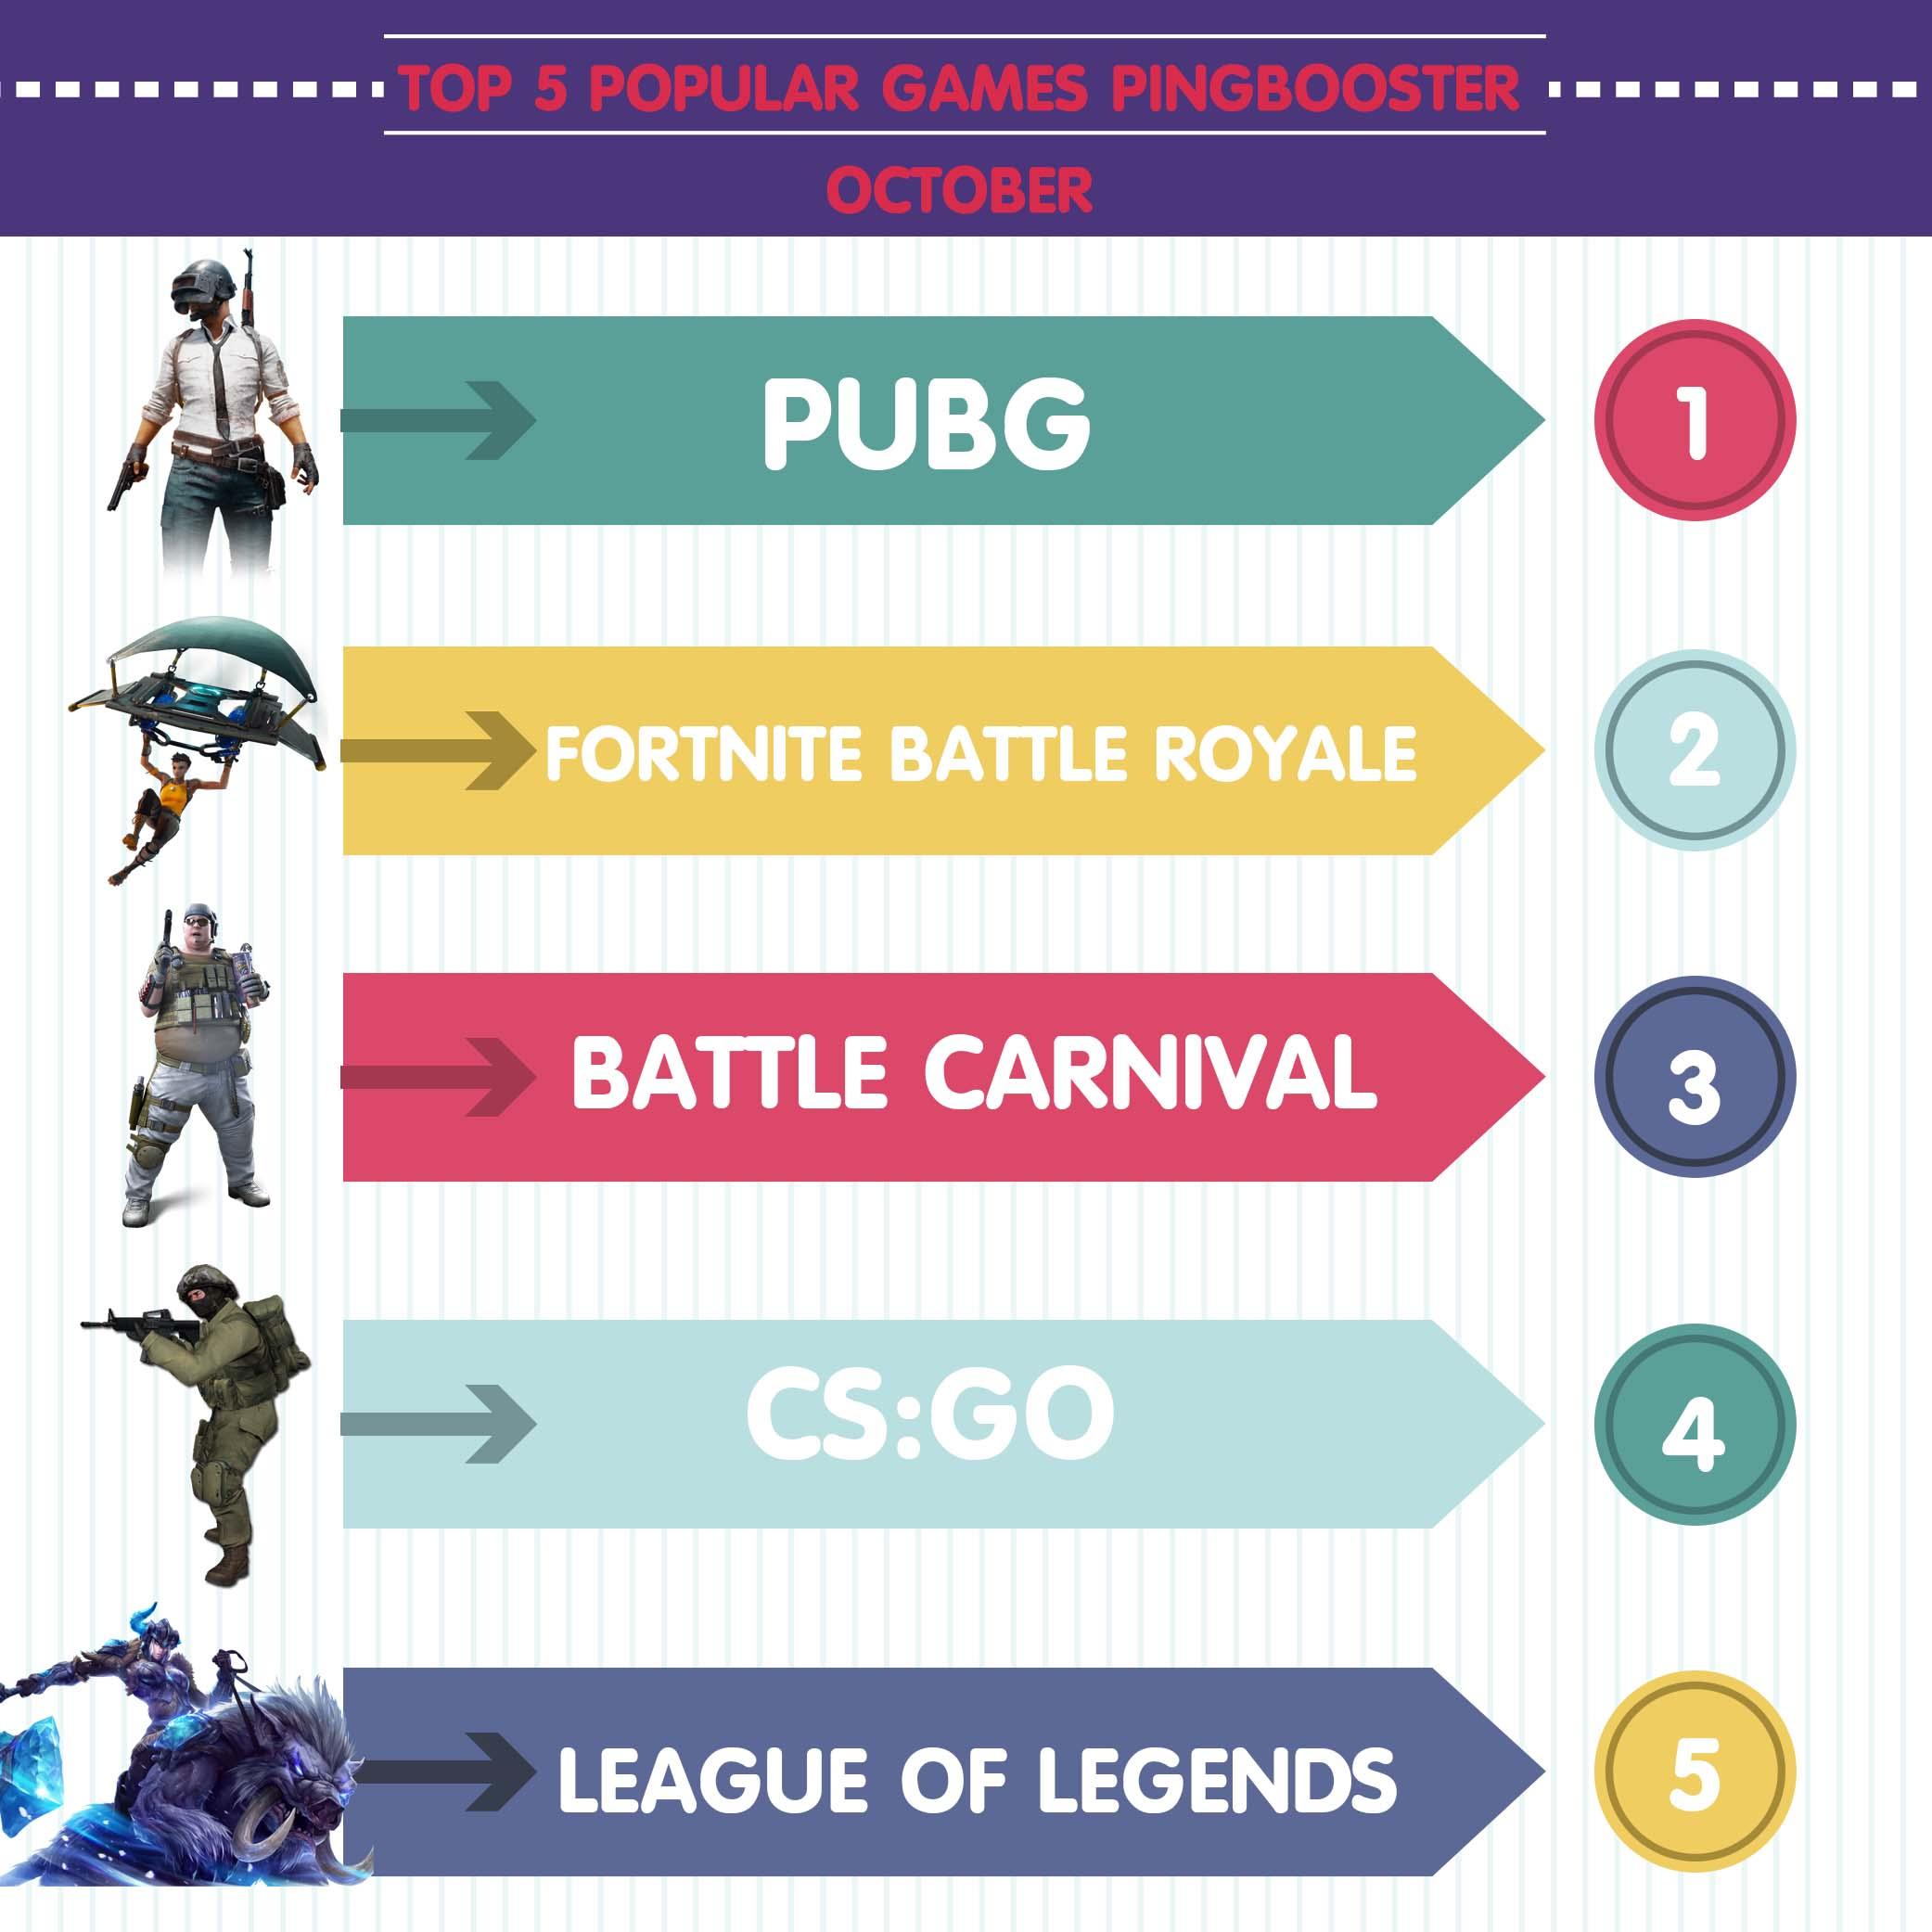 Top 5 เกมยอดนิยมใน PingBooster ประจำเดือน ตุลาคม